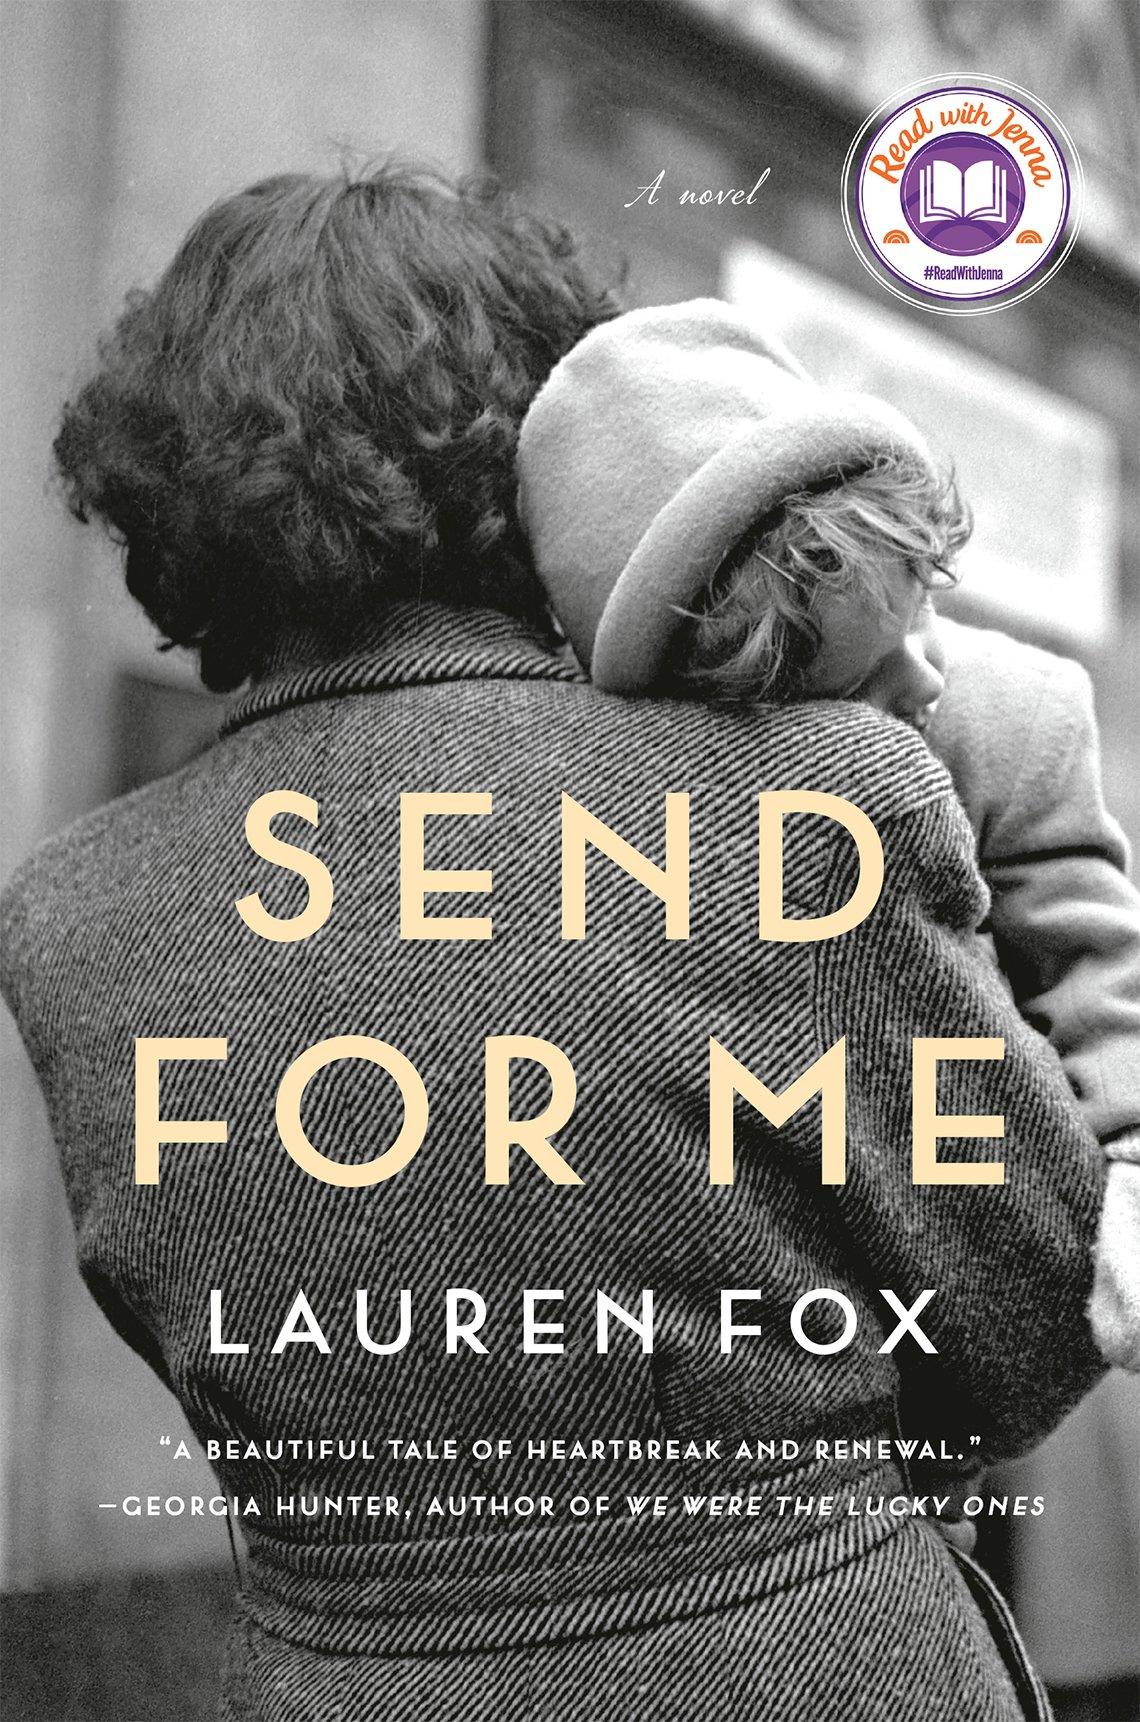 Portada del libro Send for Me de Lauren Fox.